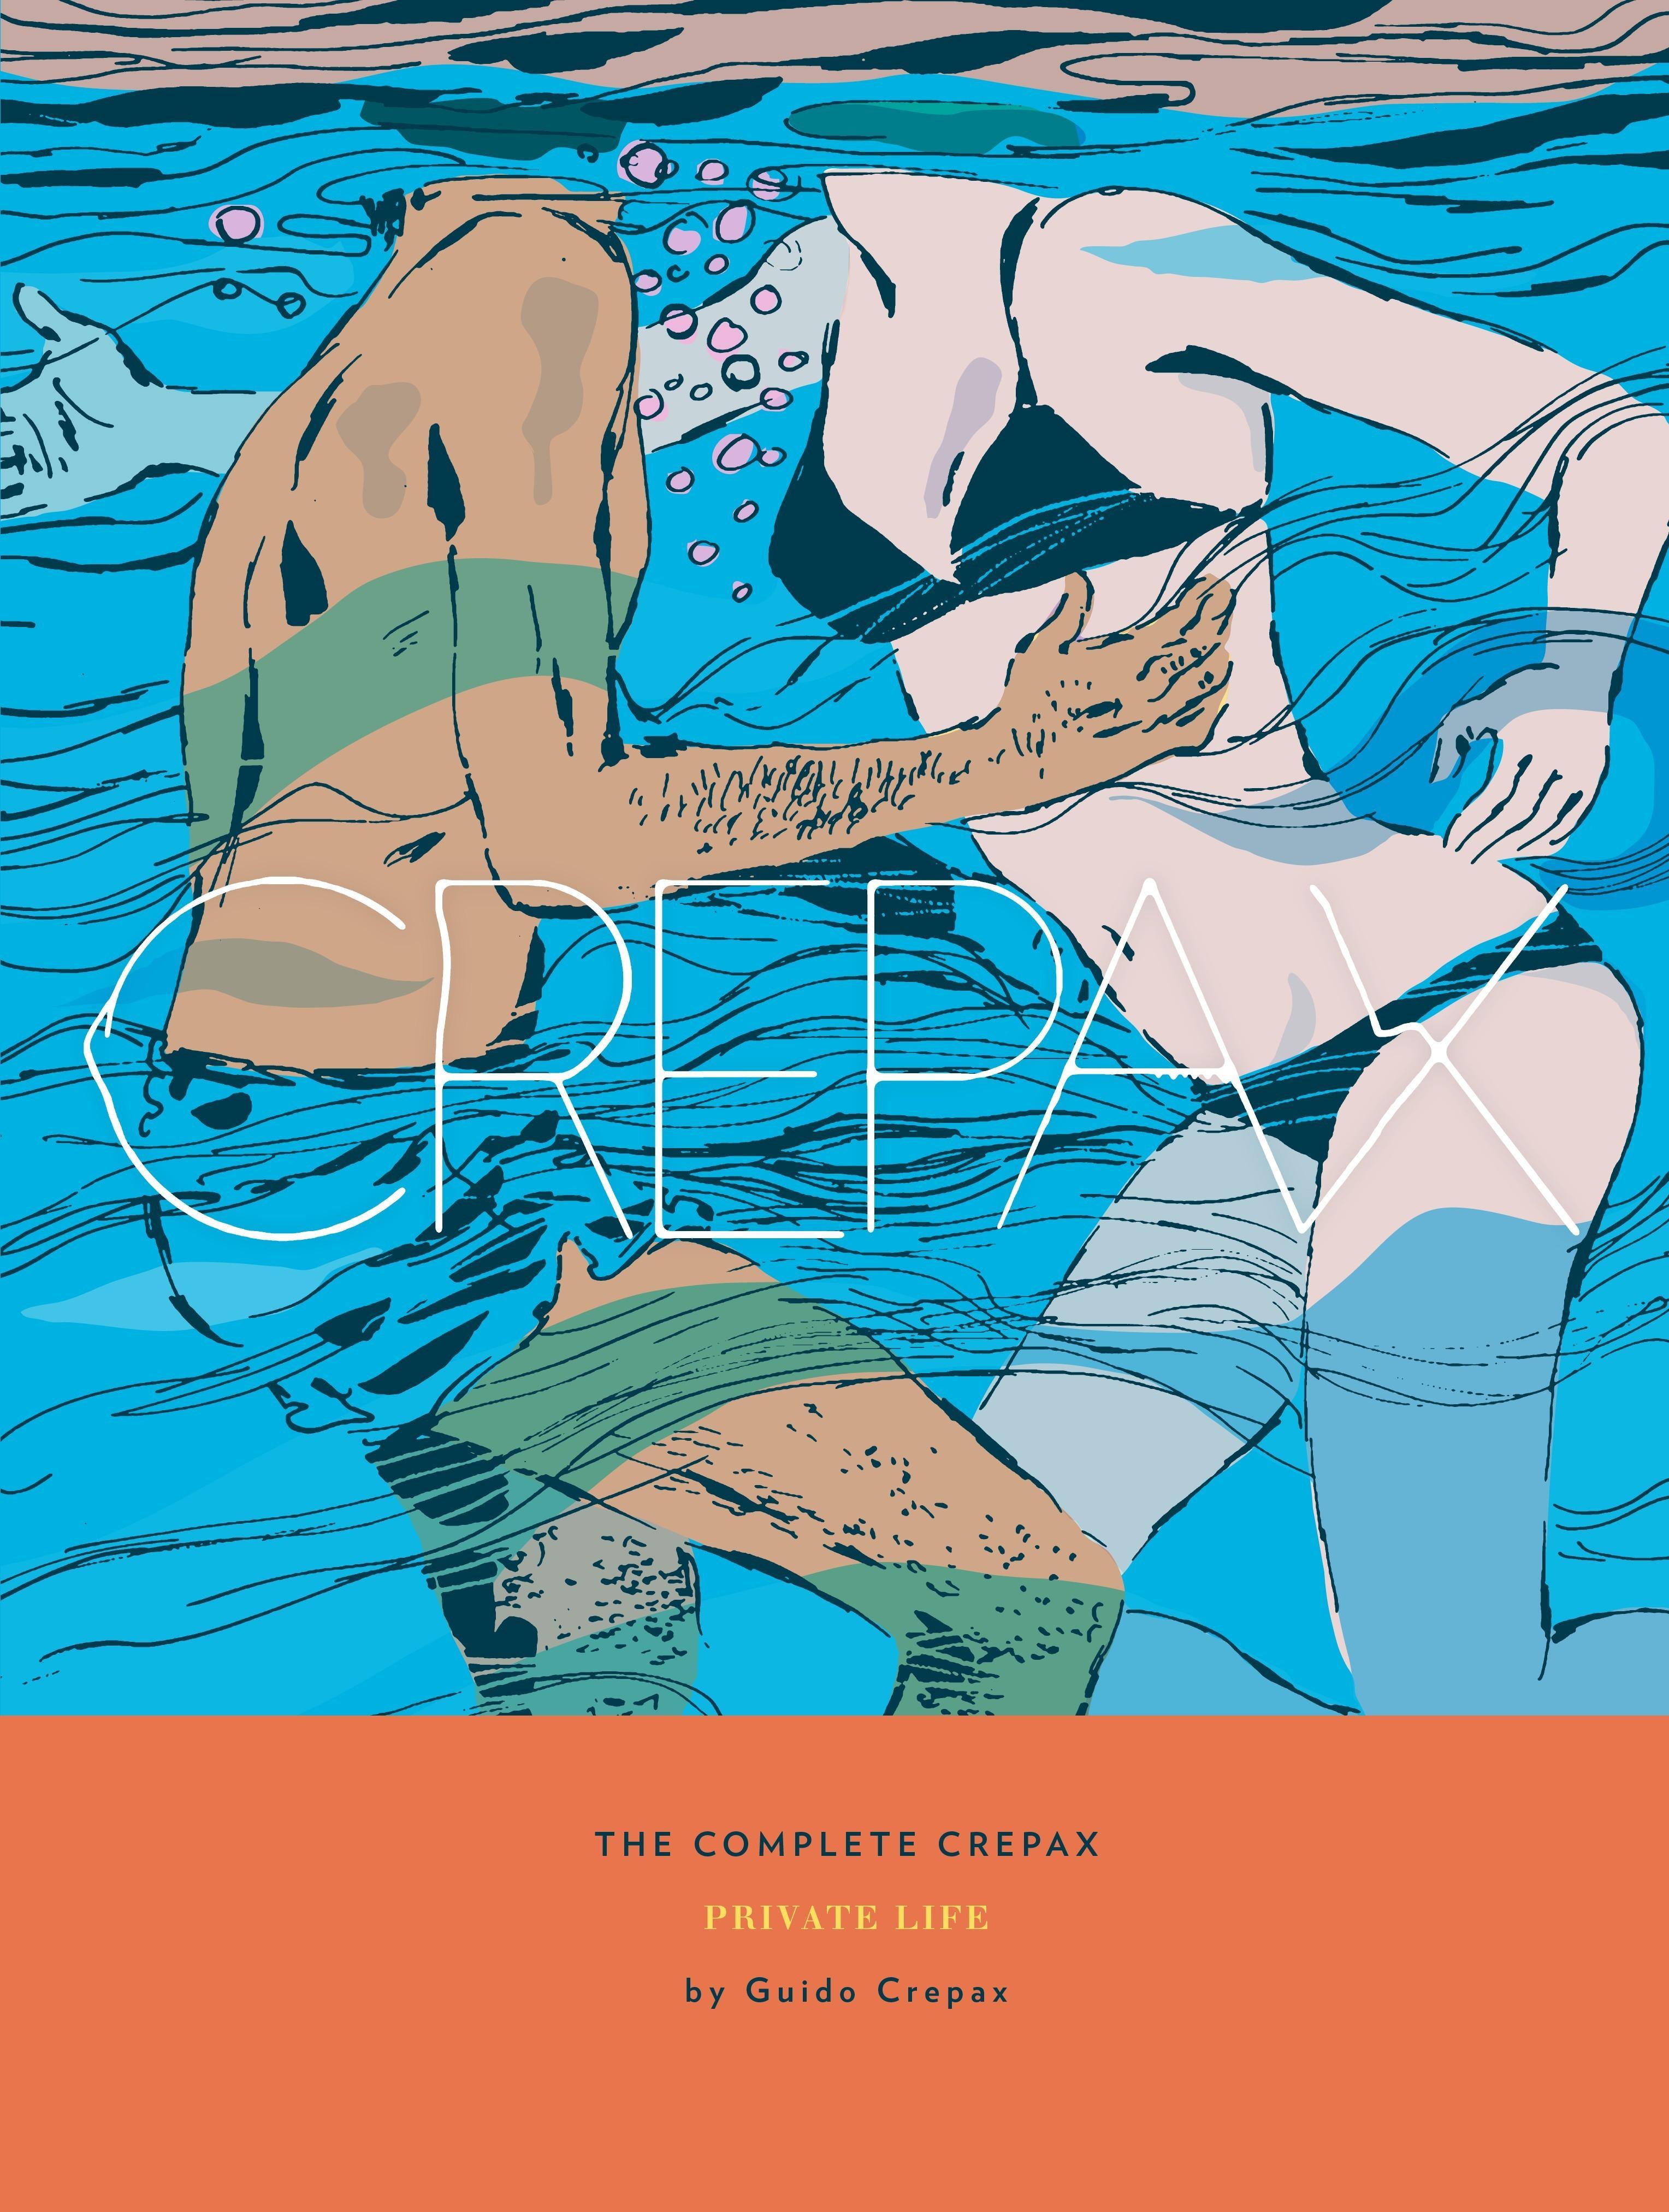 The Complete Crepax v04 - Private Life (2019) (digital-Empire